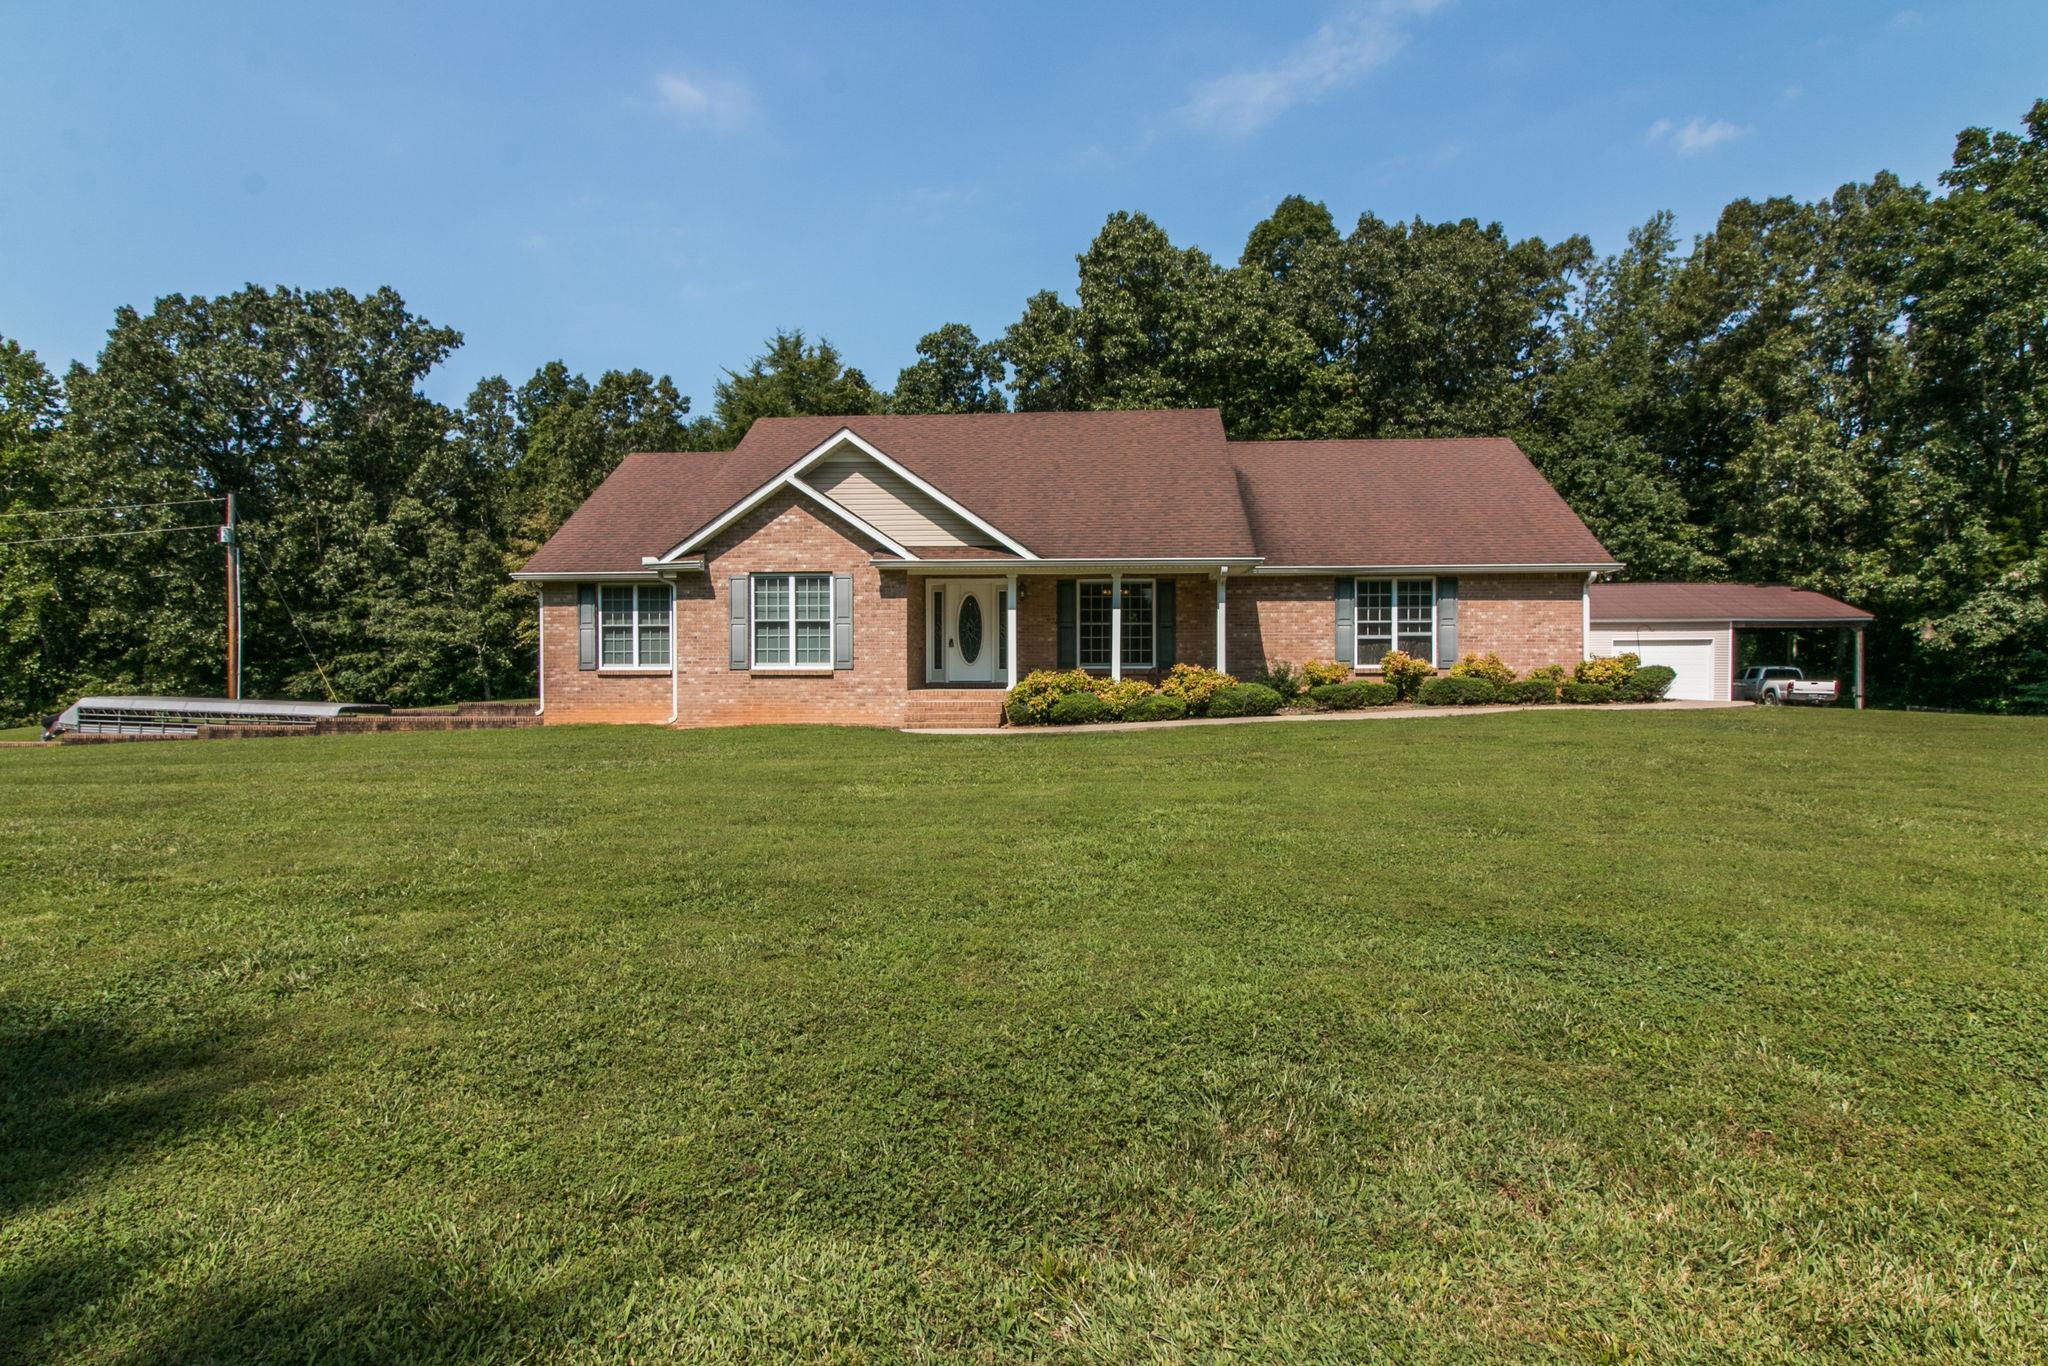 755 Gin Hollow Rd, Erin, TN 37061 - Erin, TN real estate listing